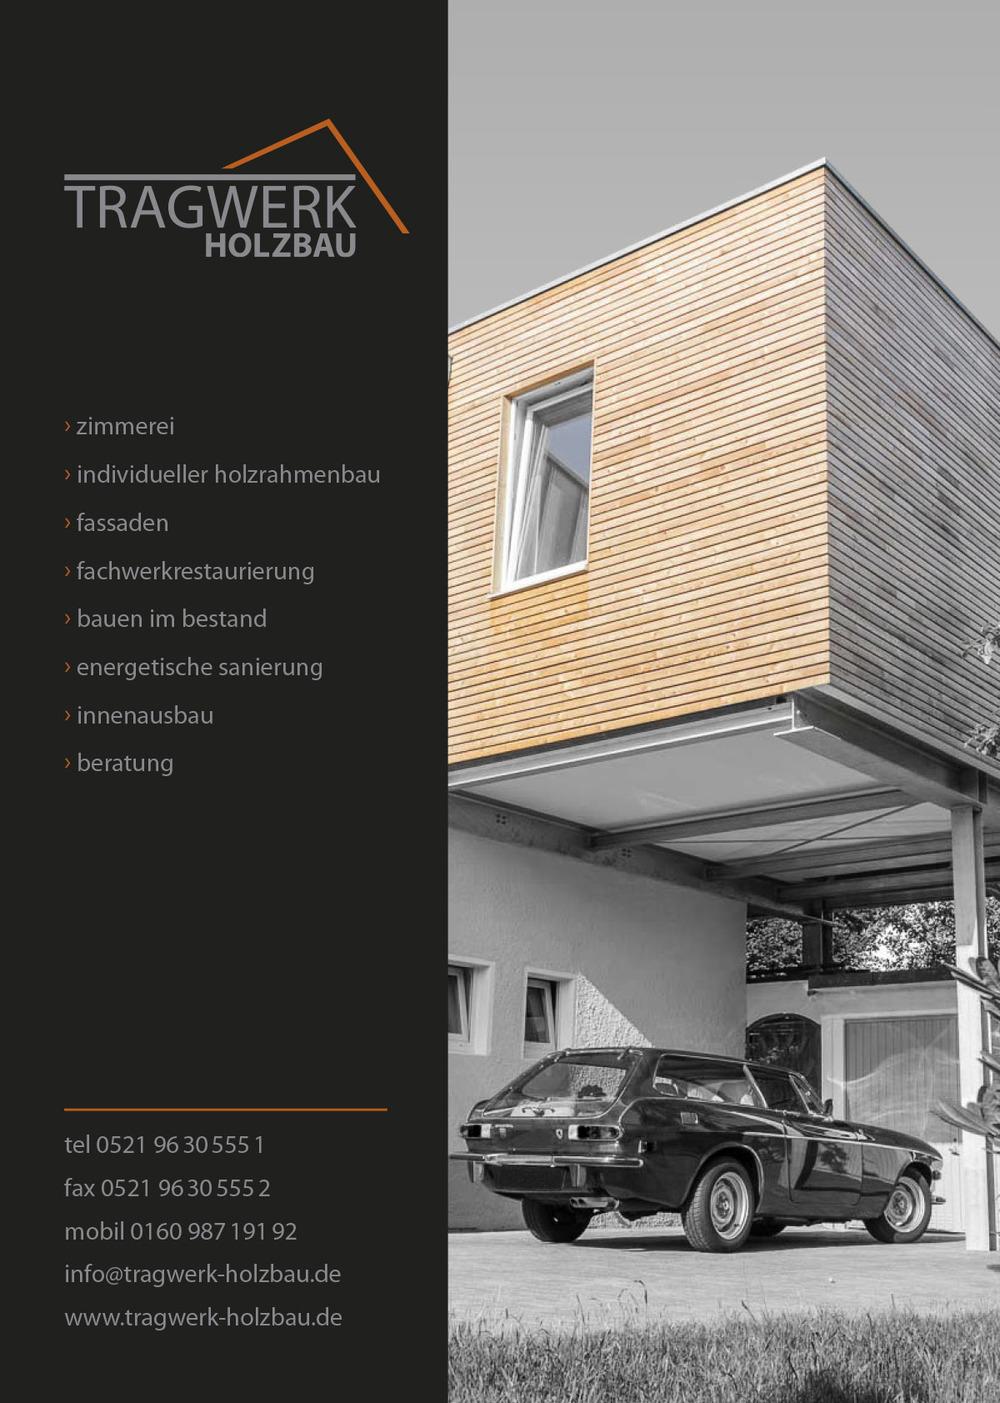 Referenz_Tragwerk-Holzbau.jpg